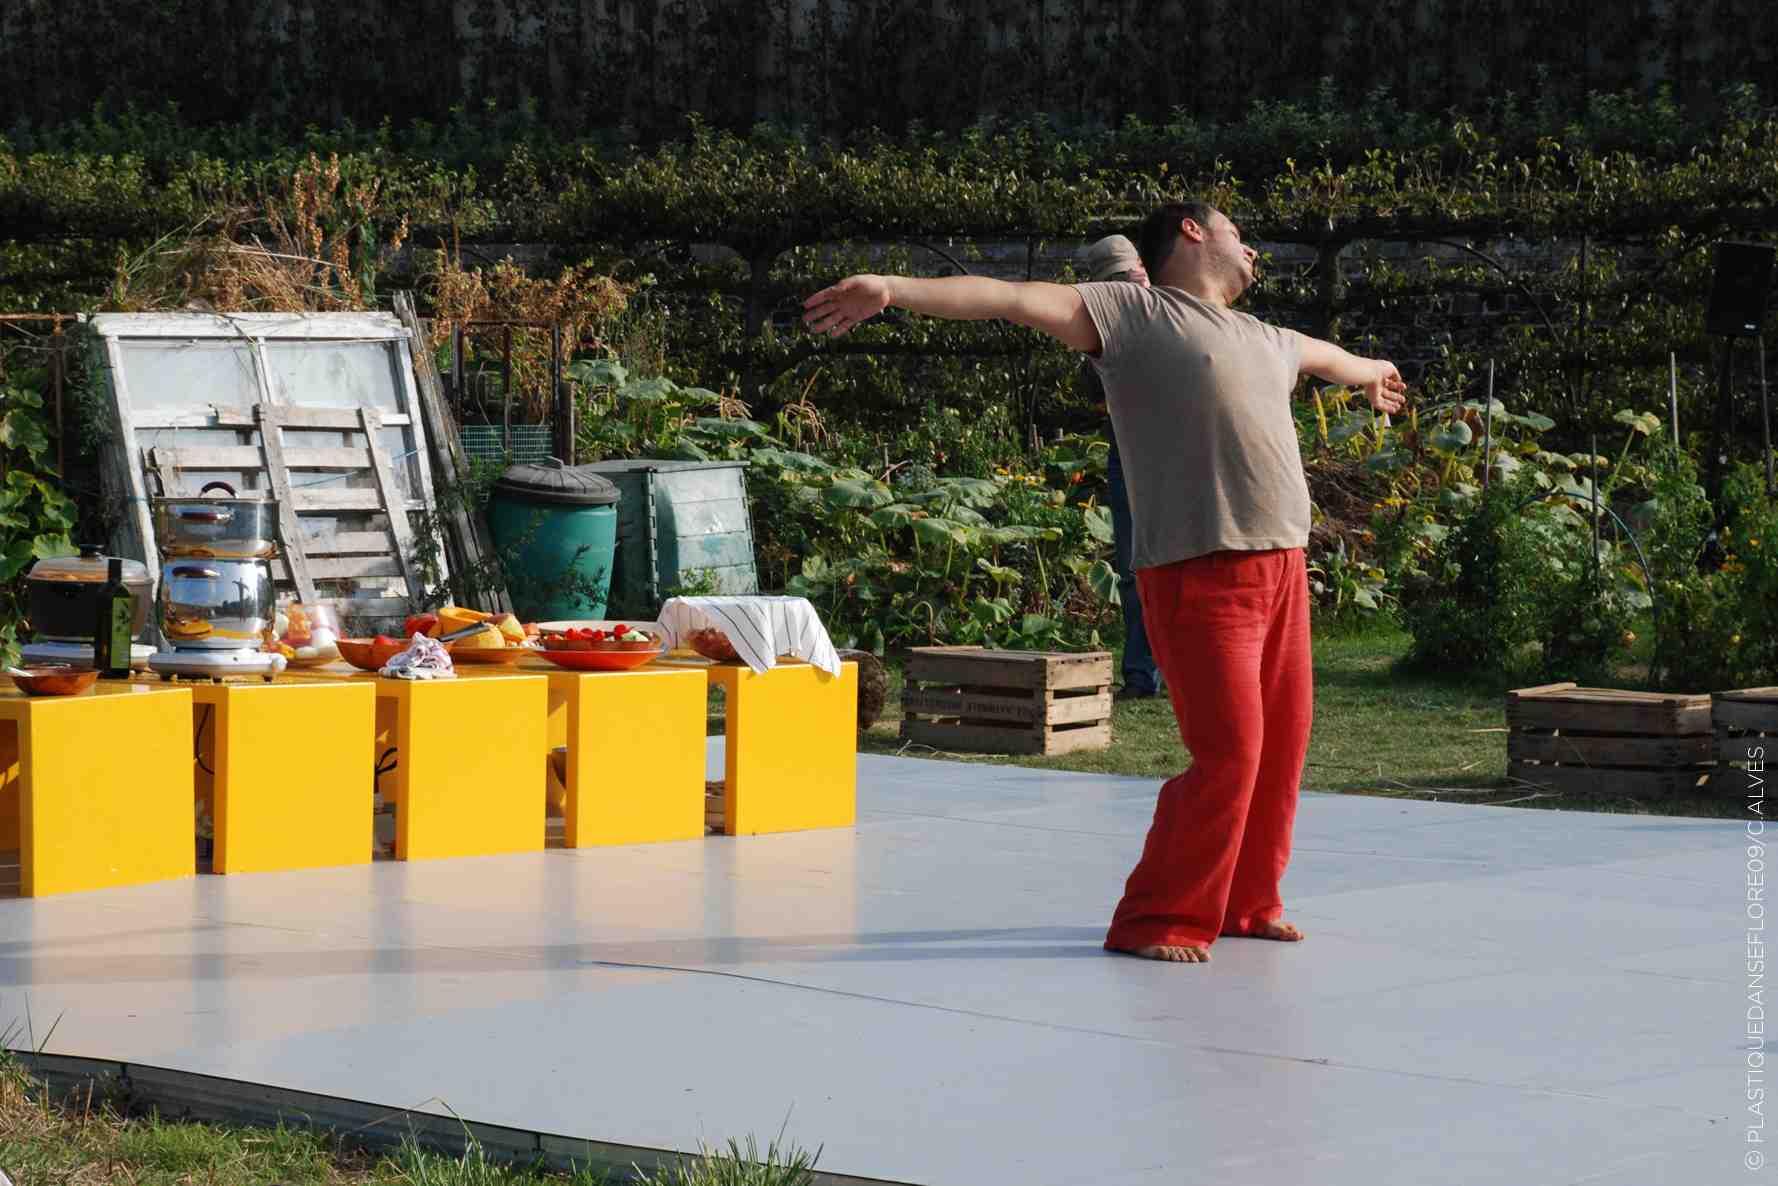 Radhouane El Meddeb - Je danse et je vous en donne à bouffer © Catherine Alves